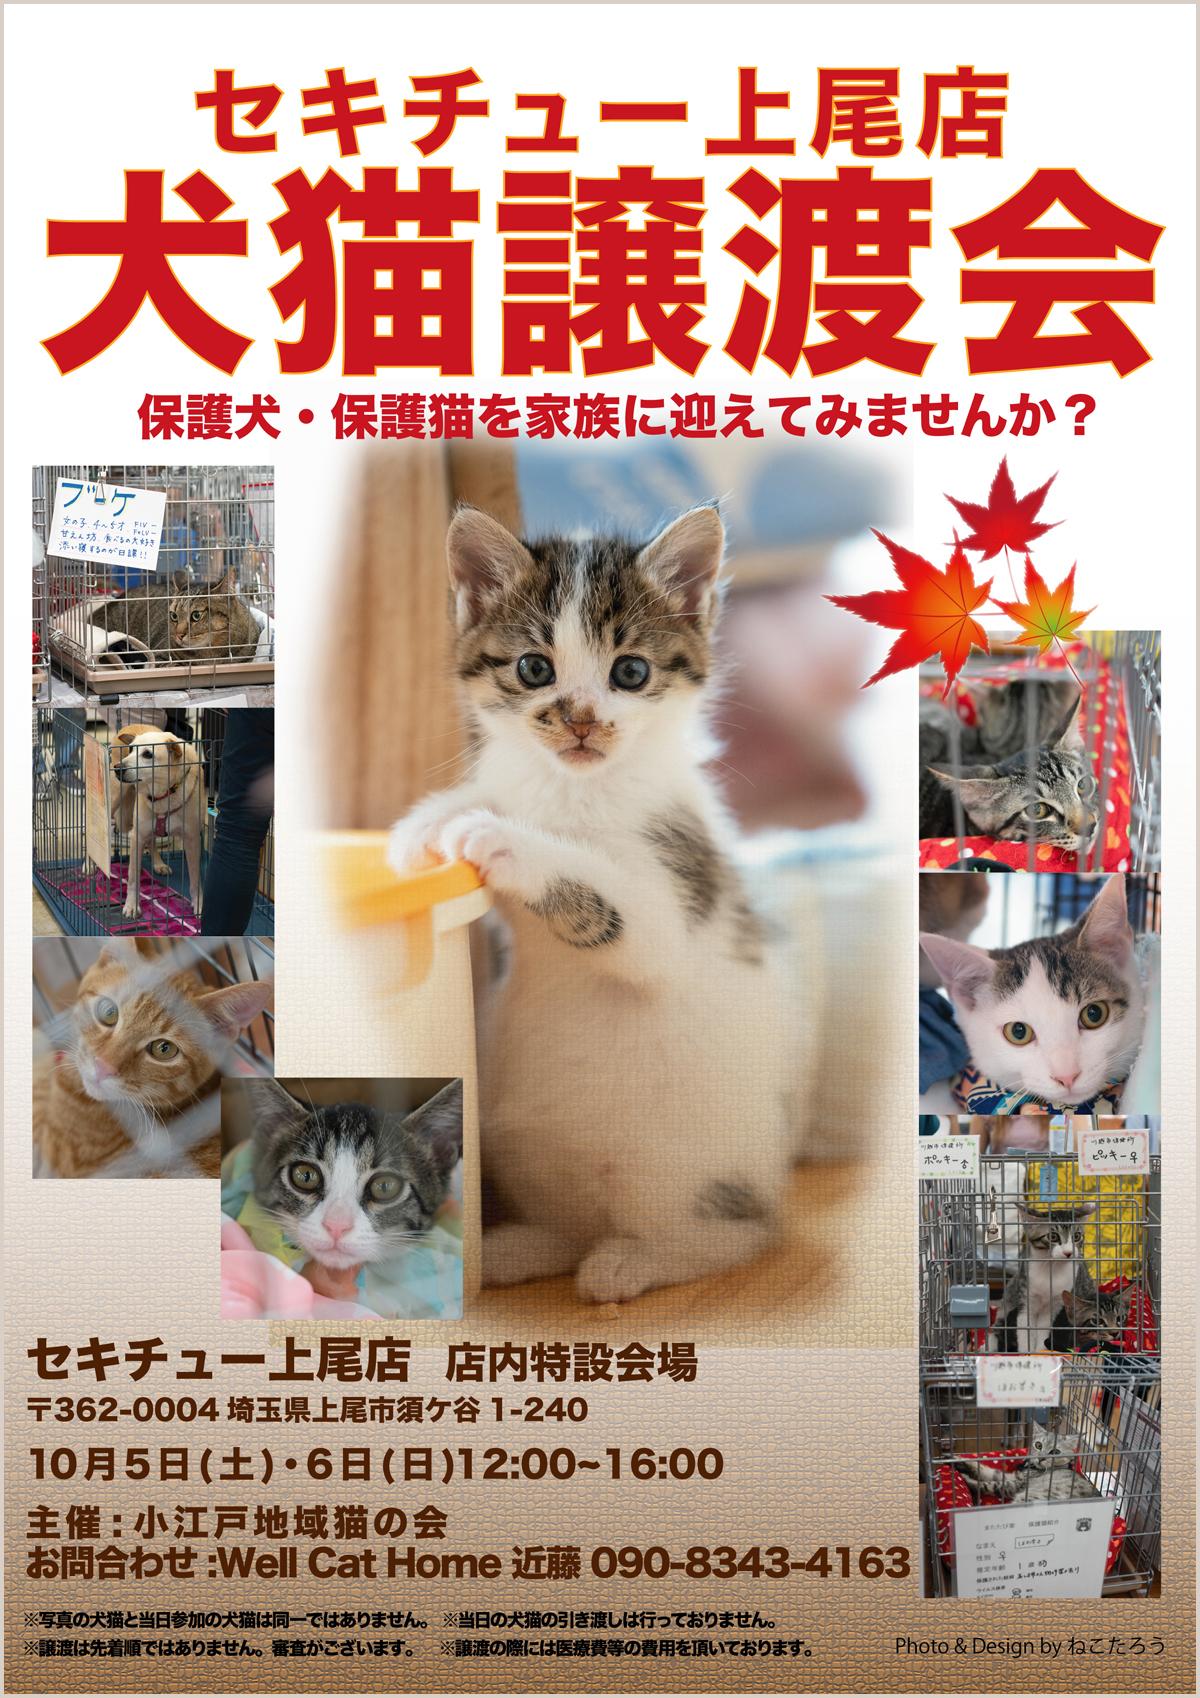 sekichu10_print-72.jpg